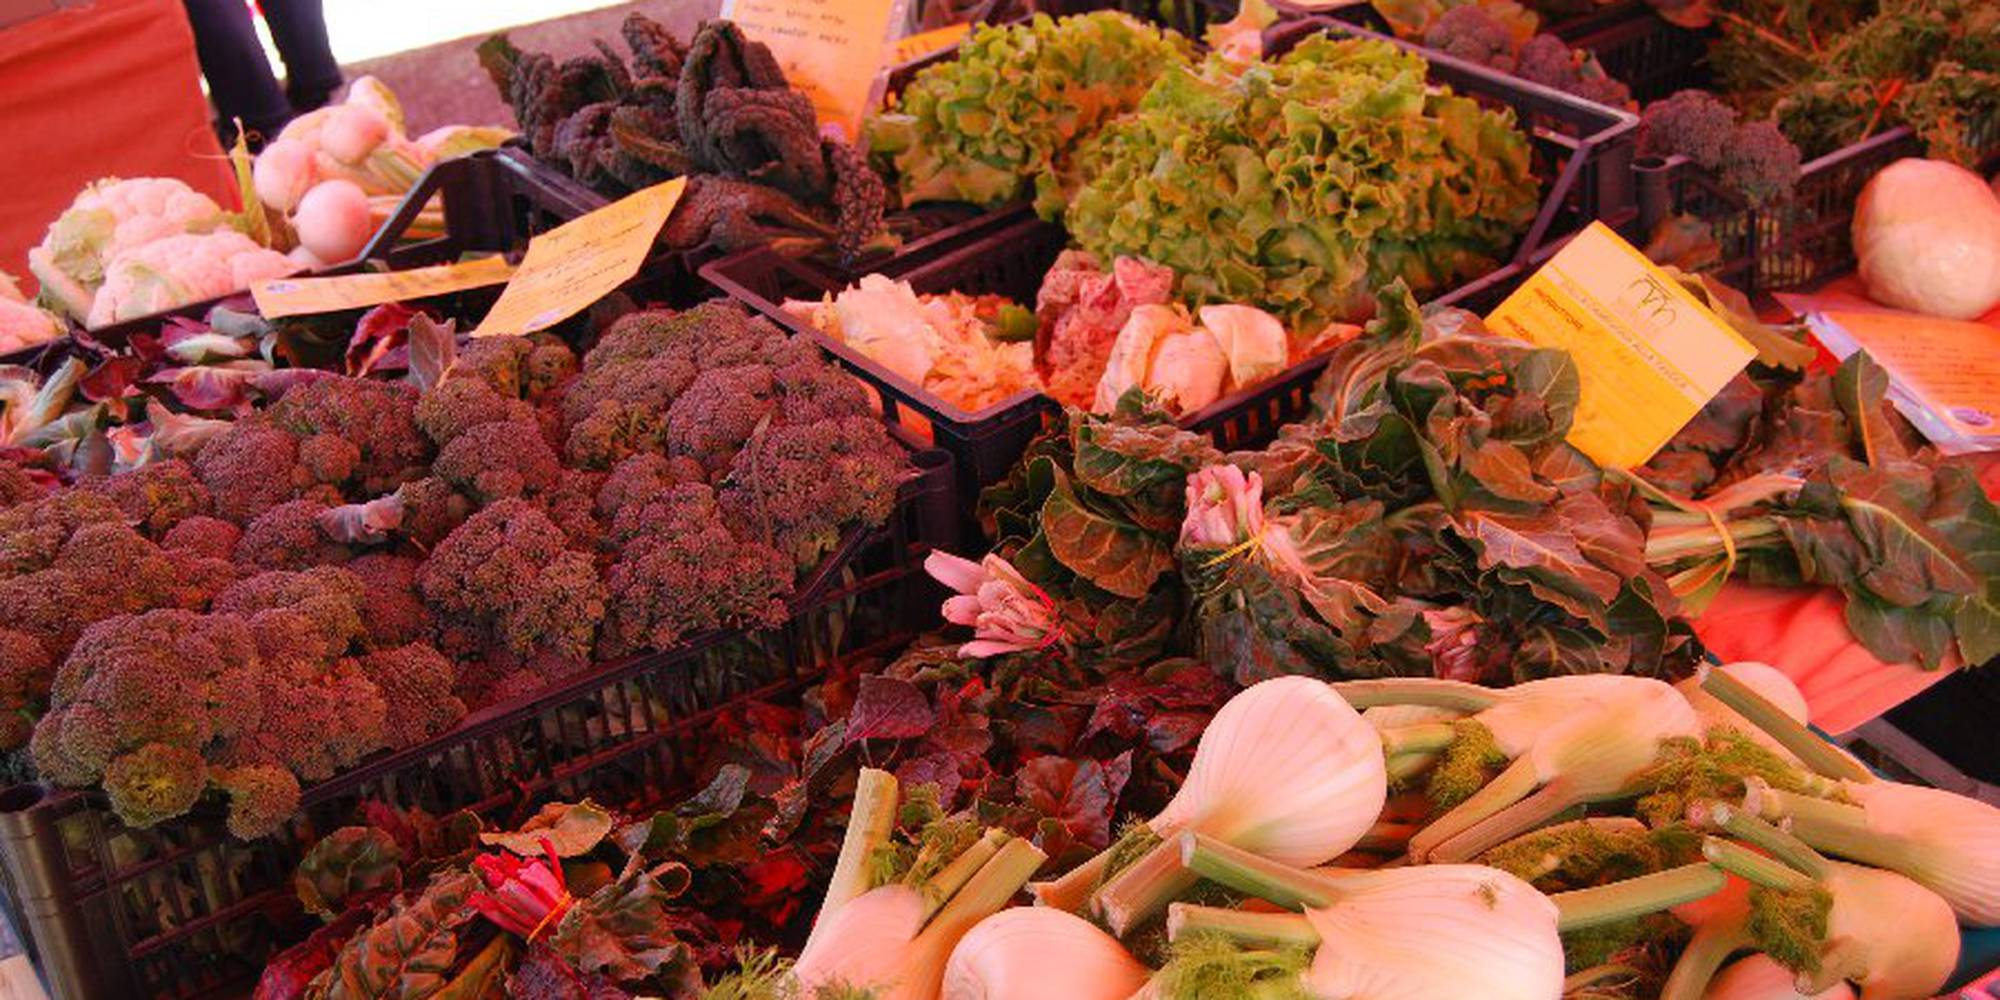 prodotti_mercato_contadino_borgo_230319_(114).jpg